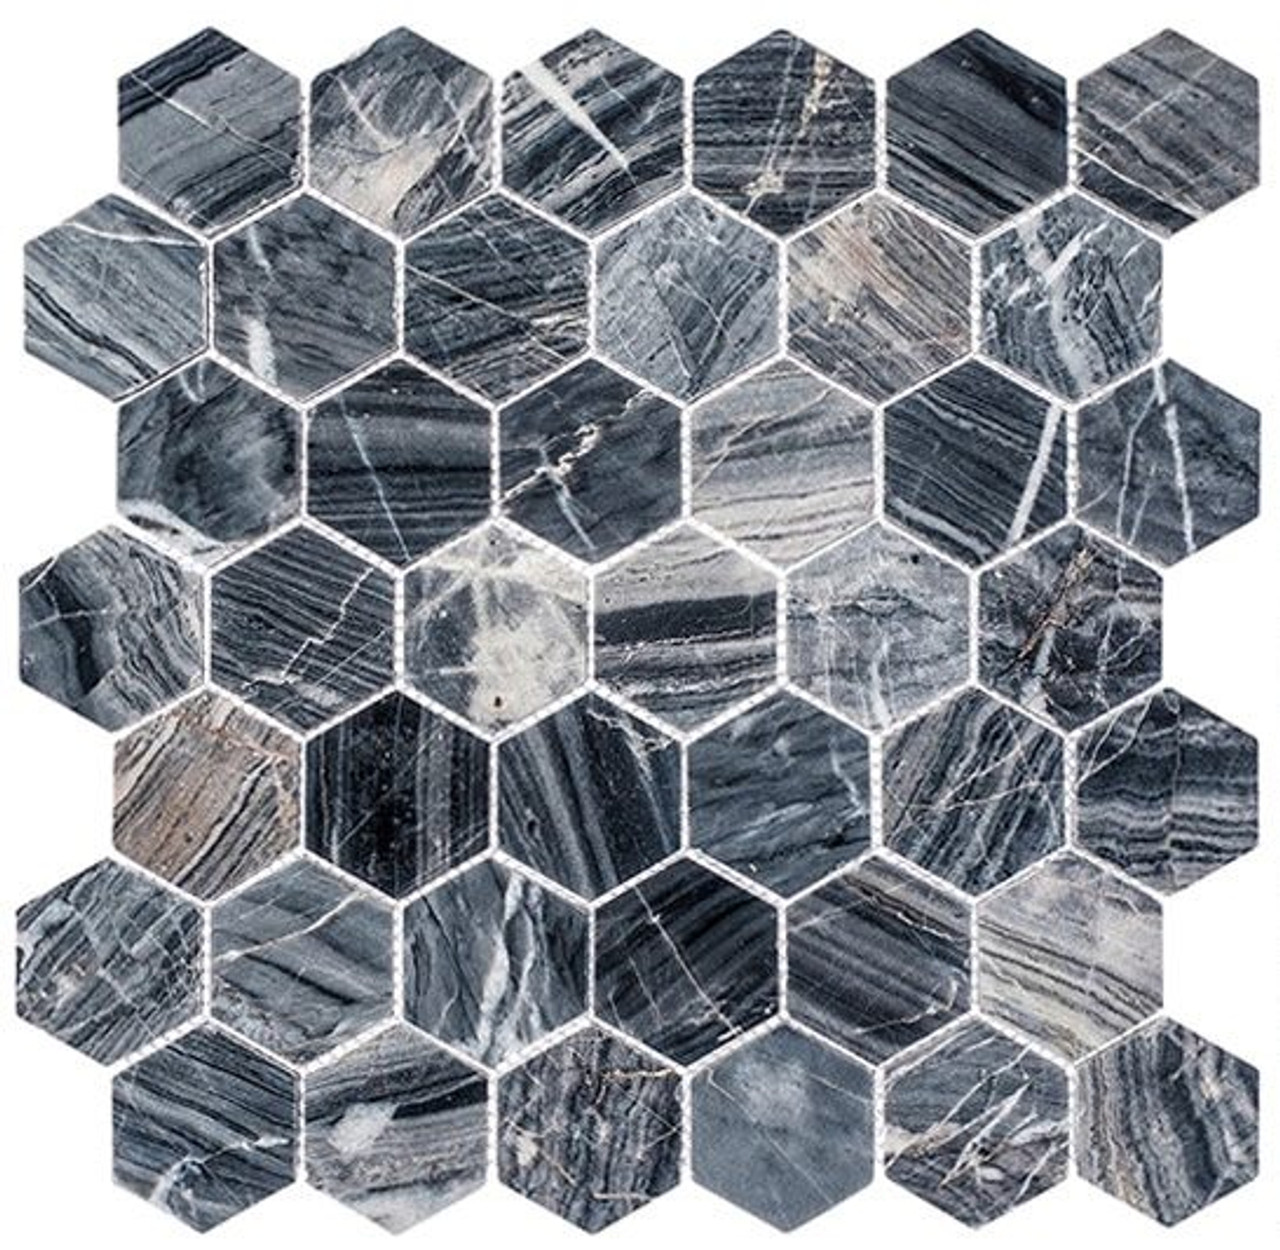 Bella Glass Tiles Colonial 2 Inch Hex Salem Charcoal CLNL277